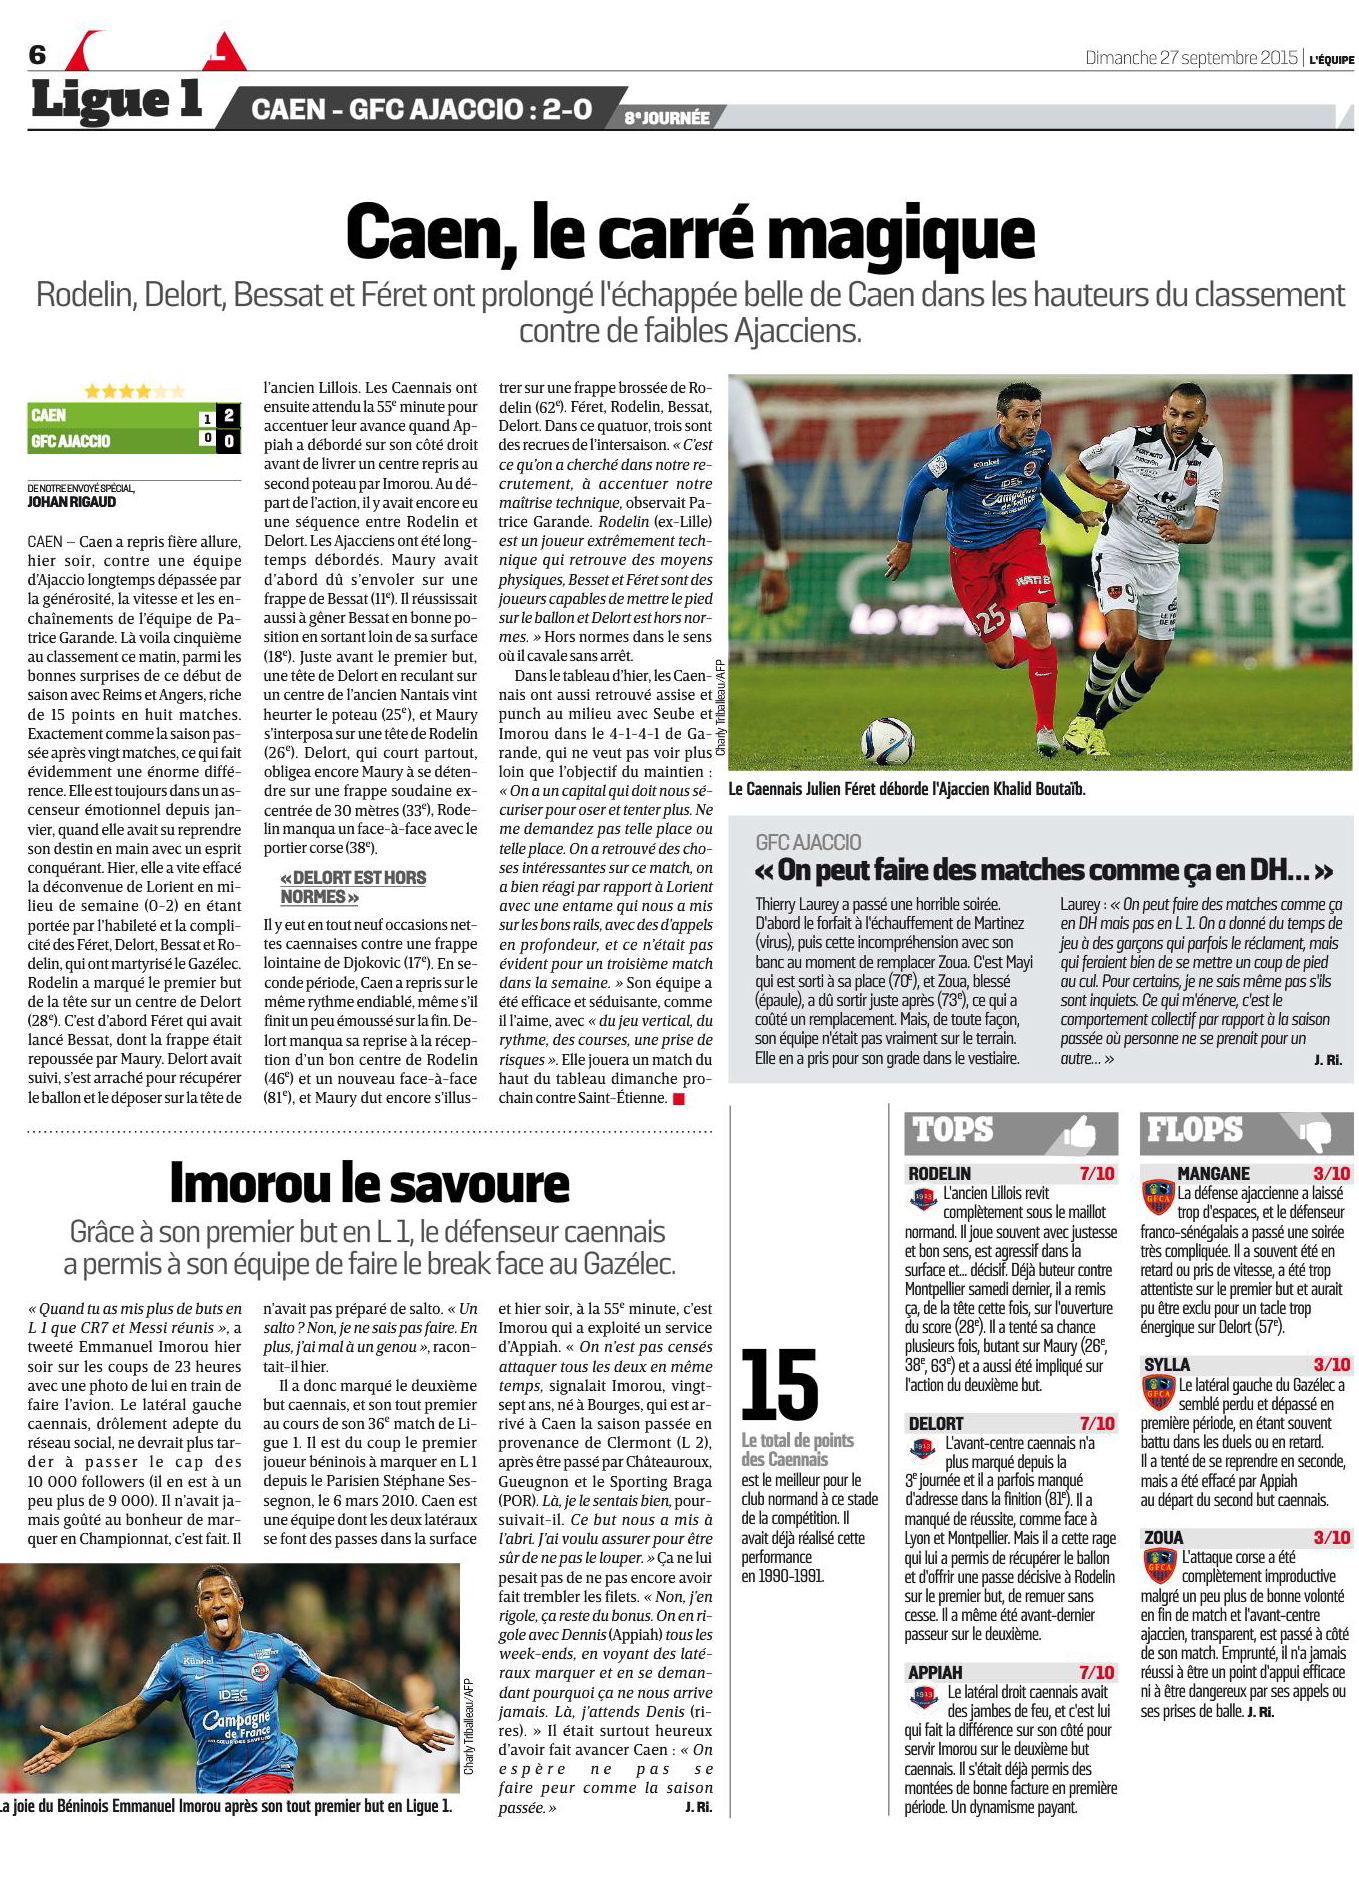 [8e journée de L1] SM Caen 2-0 GFC Ajaccio 884936Ajaccio